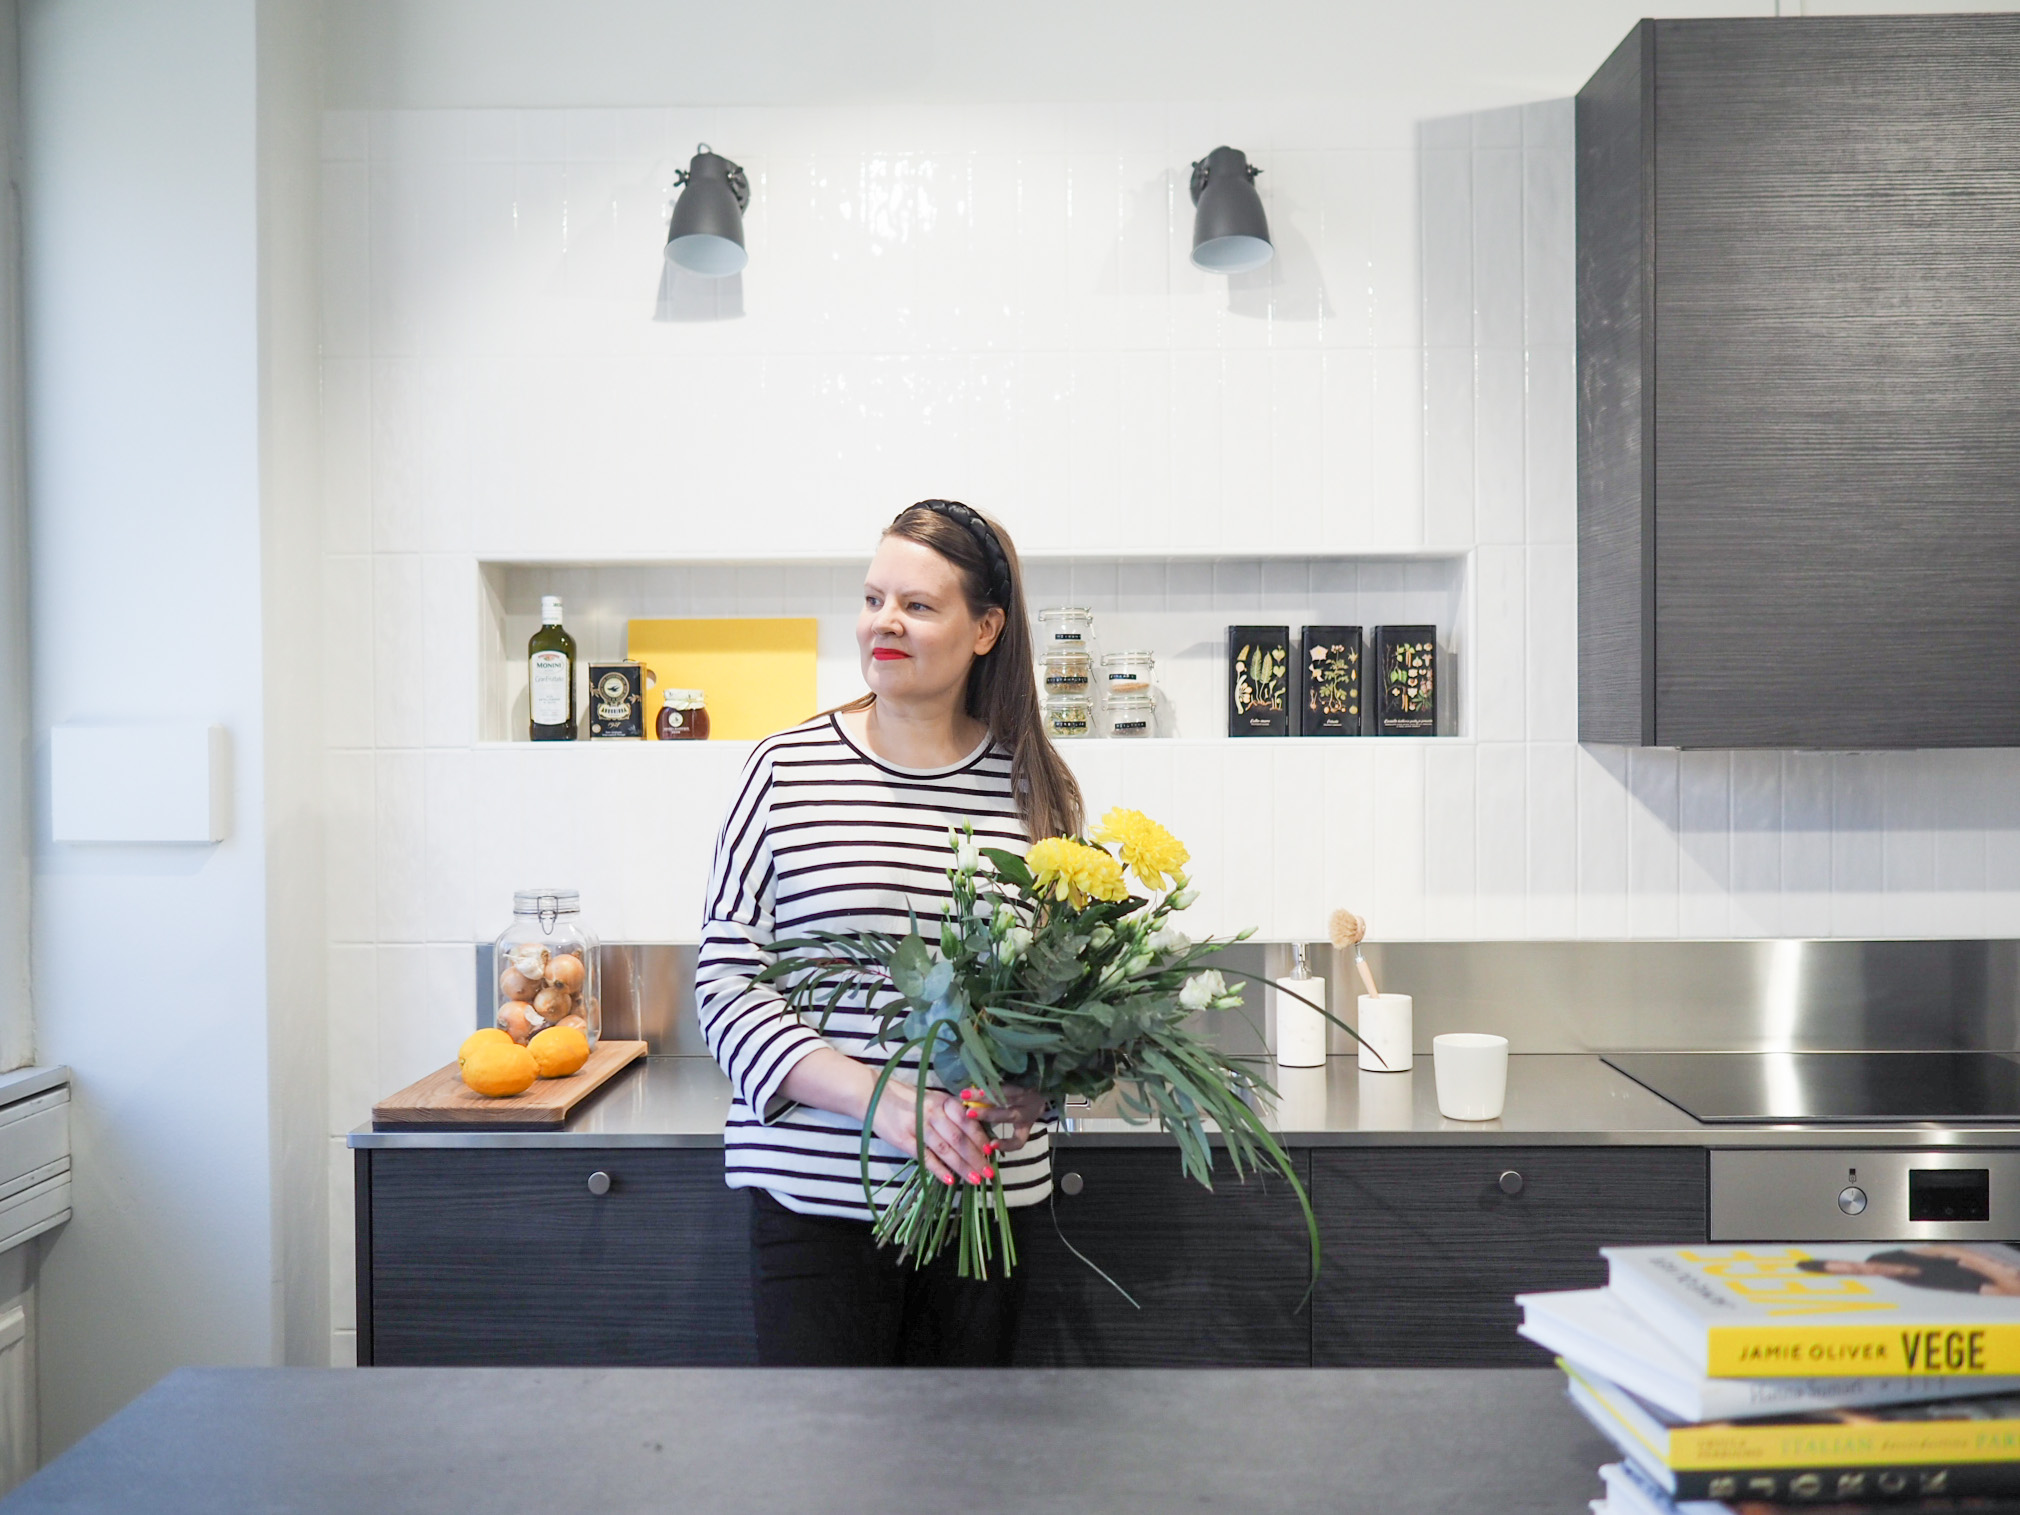 Miia Suvi Ideal keittiöt